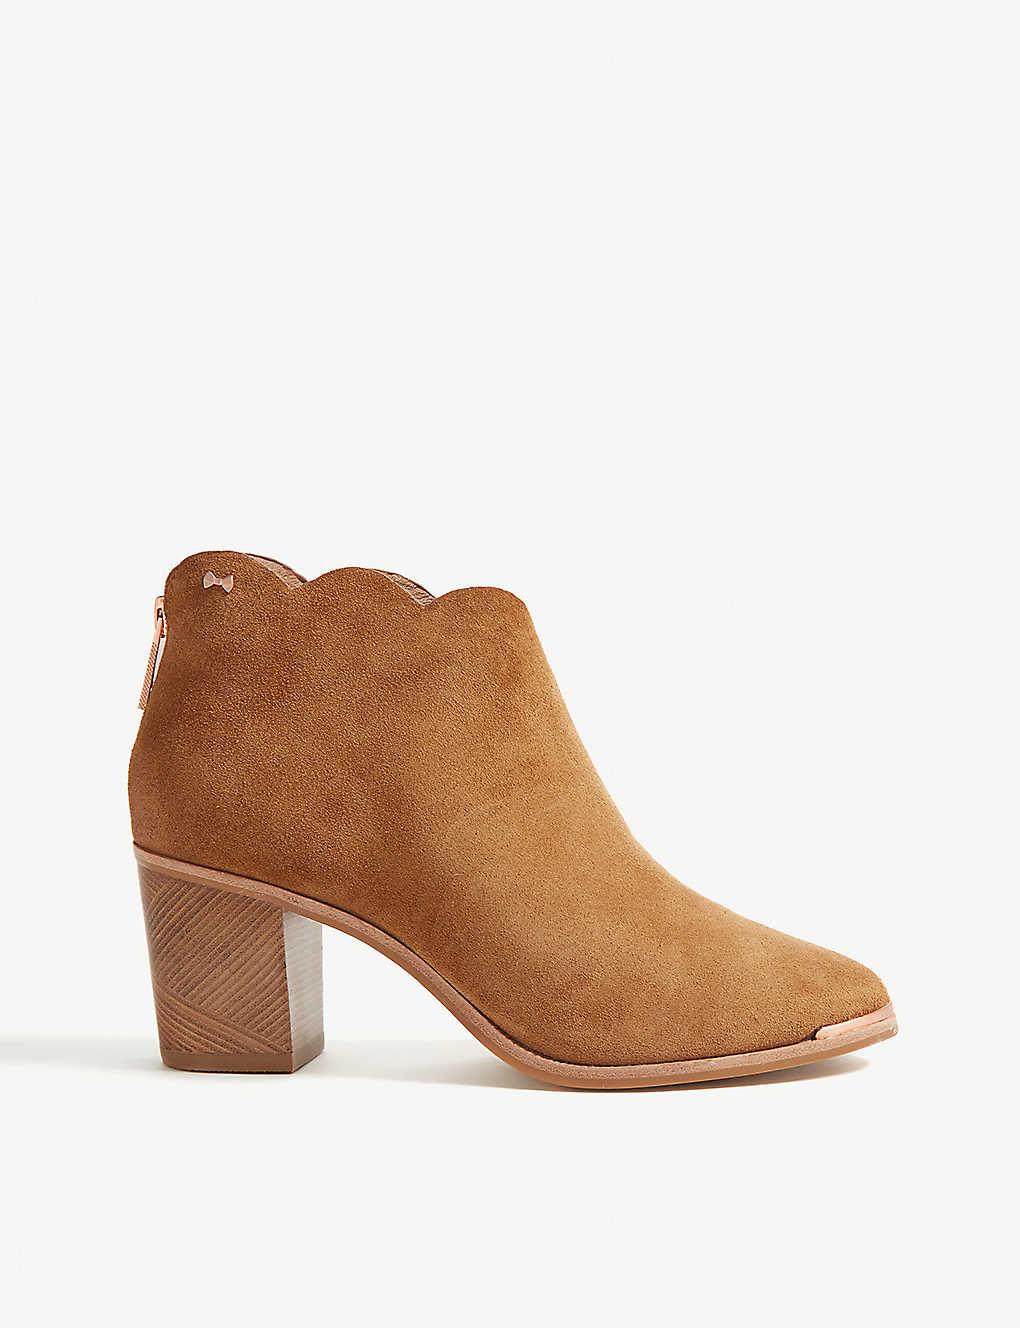 0f882ac6b TED BAKER - Joanie suede heeled ankle boots | Selfridges.com